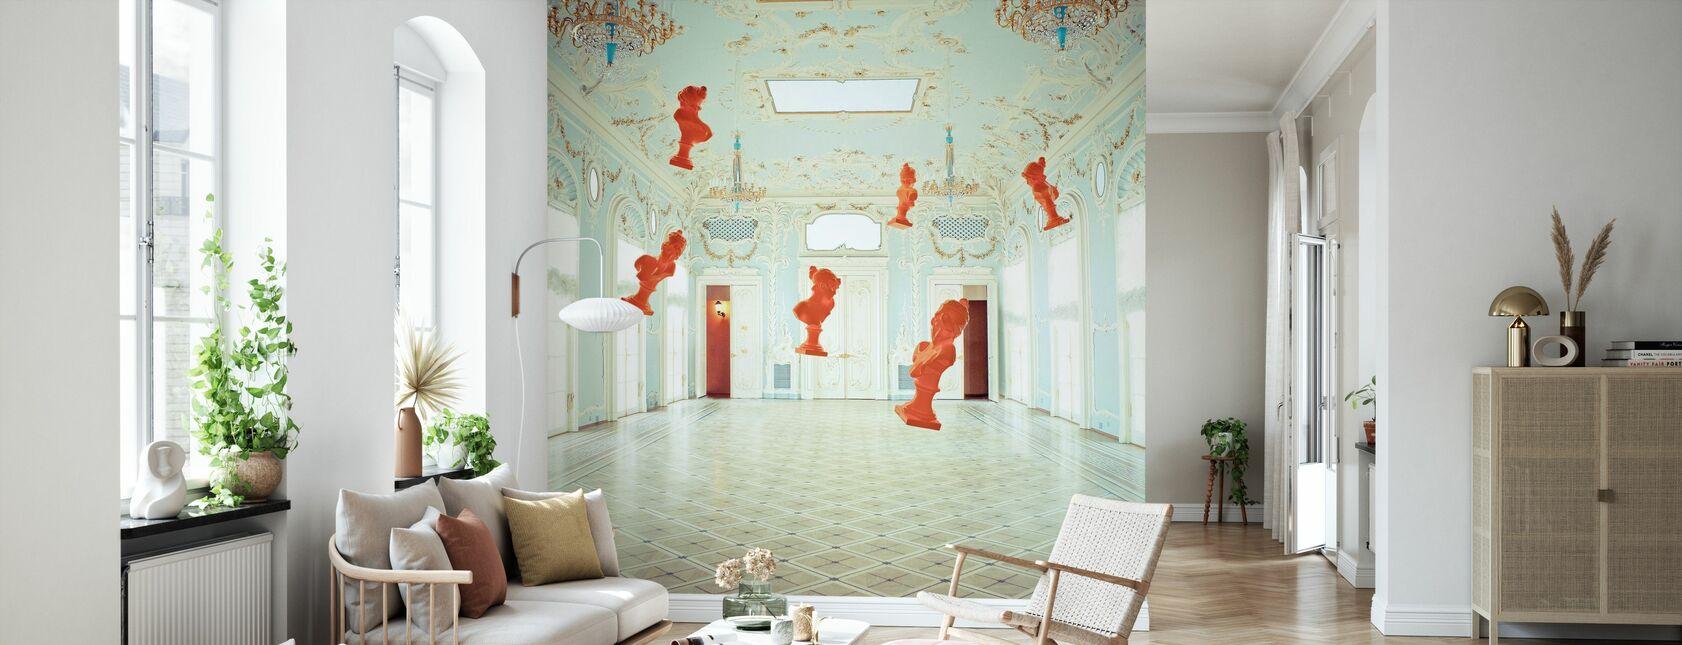 Passionate - Wallpaper - Living Room